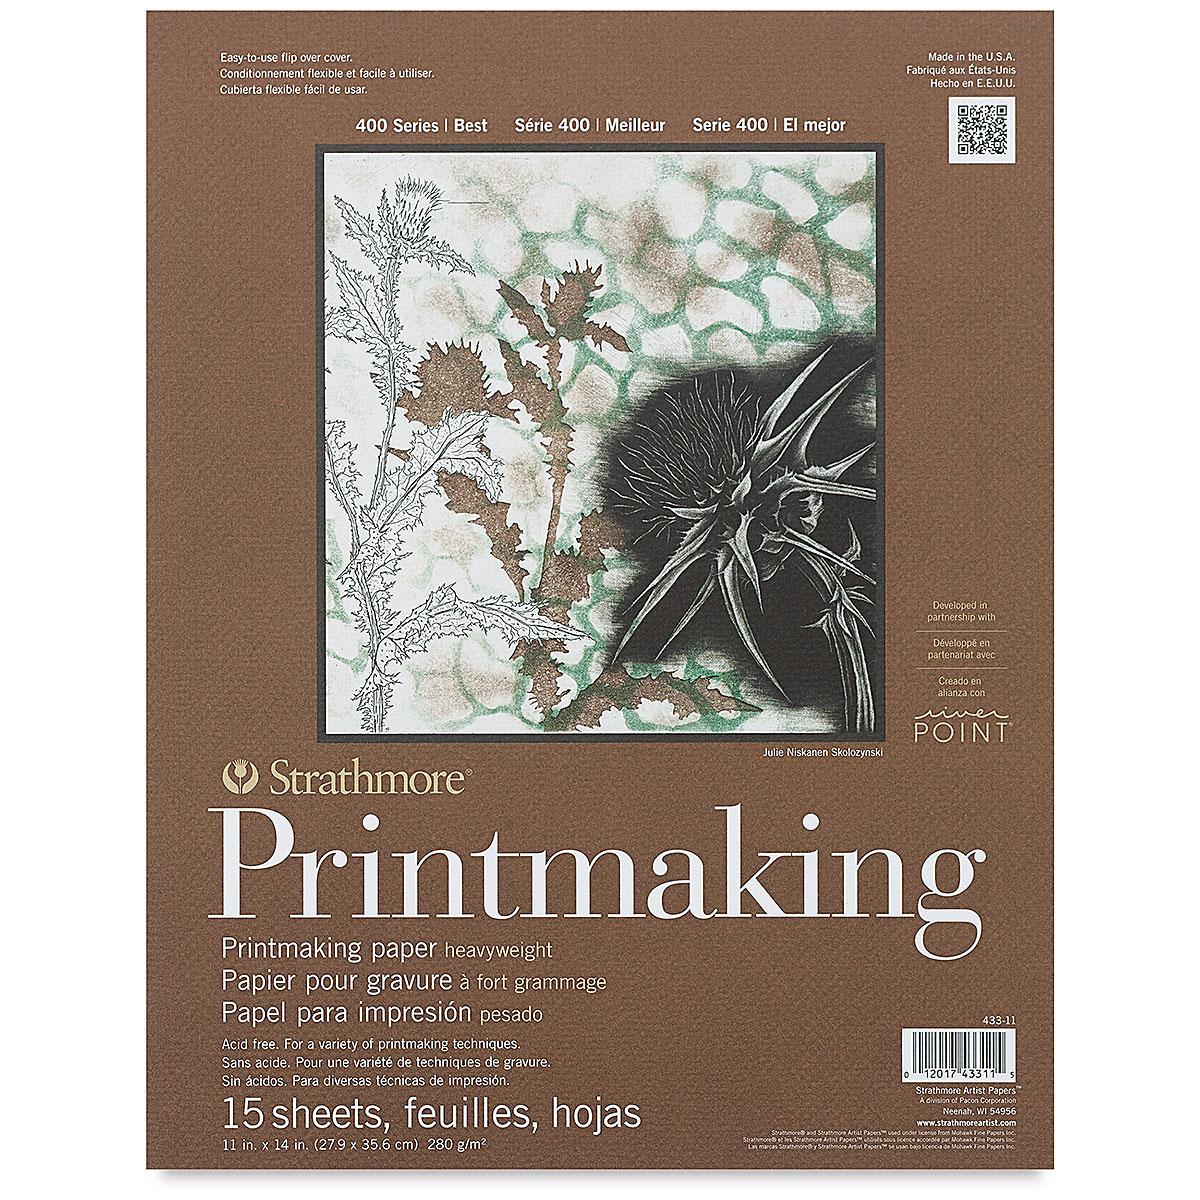 Strathmore 400 Series Printmaking Paper - 11 x 14, 15 Sheets